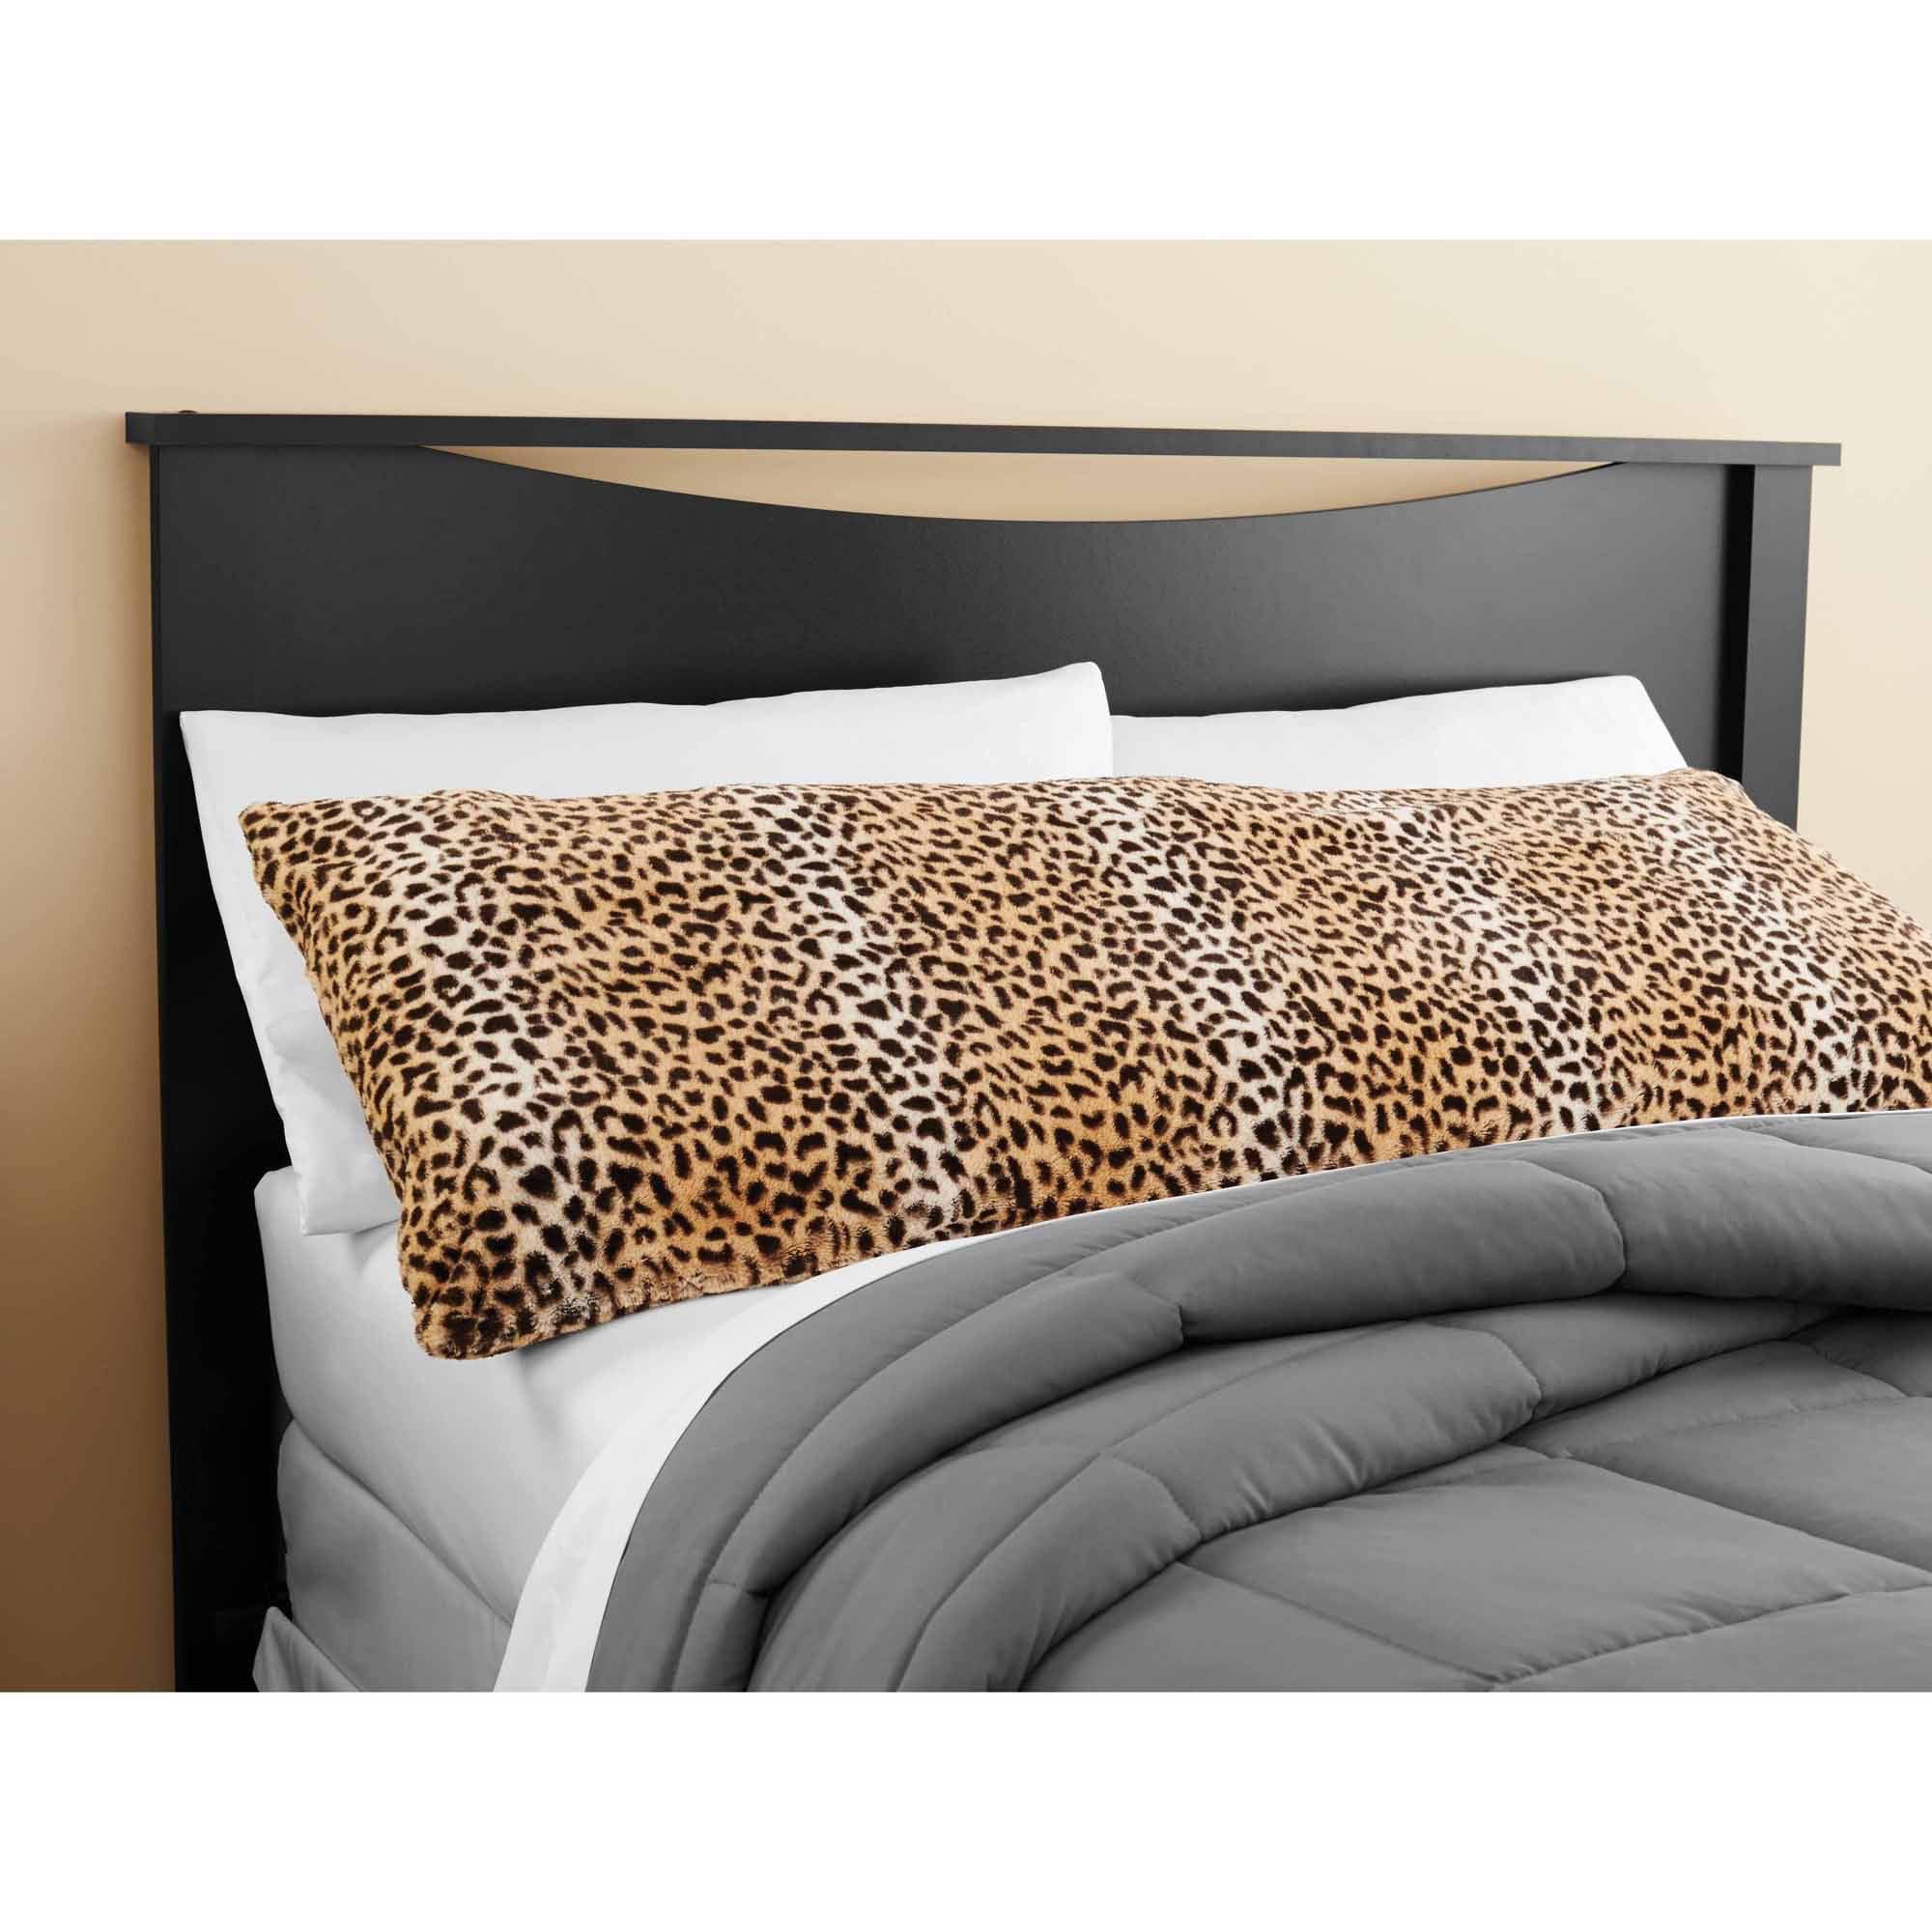 Mainstays Cheetah Fur Body Pillow Cover